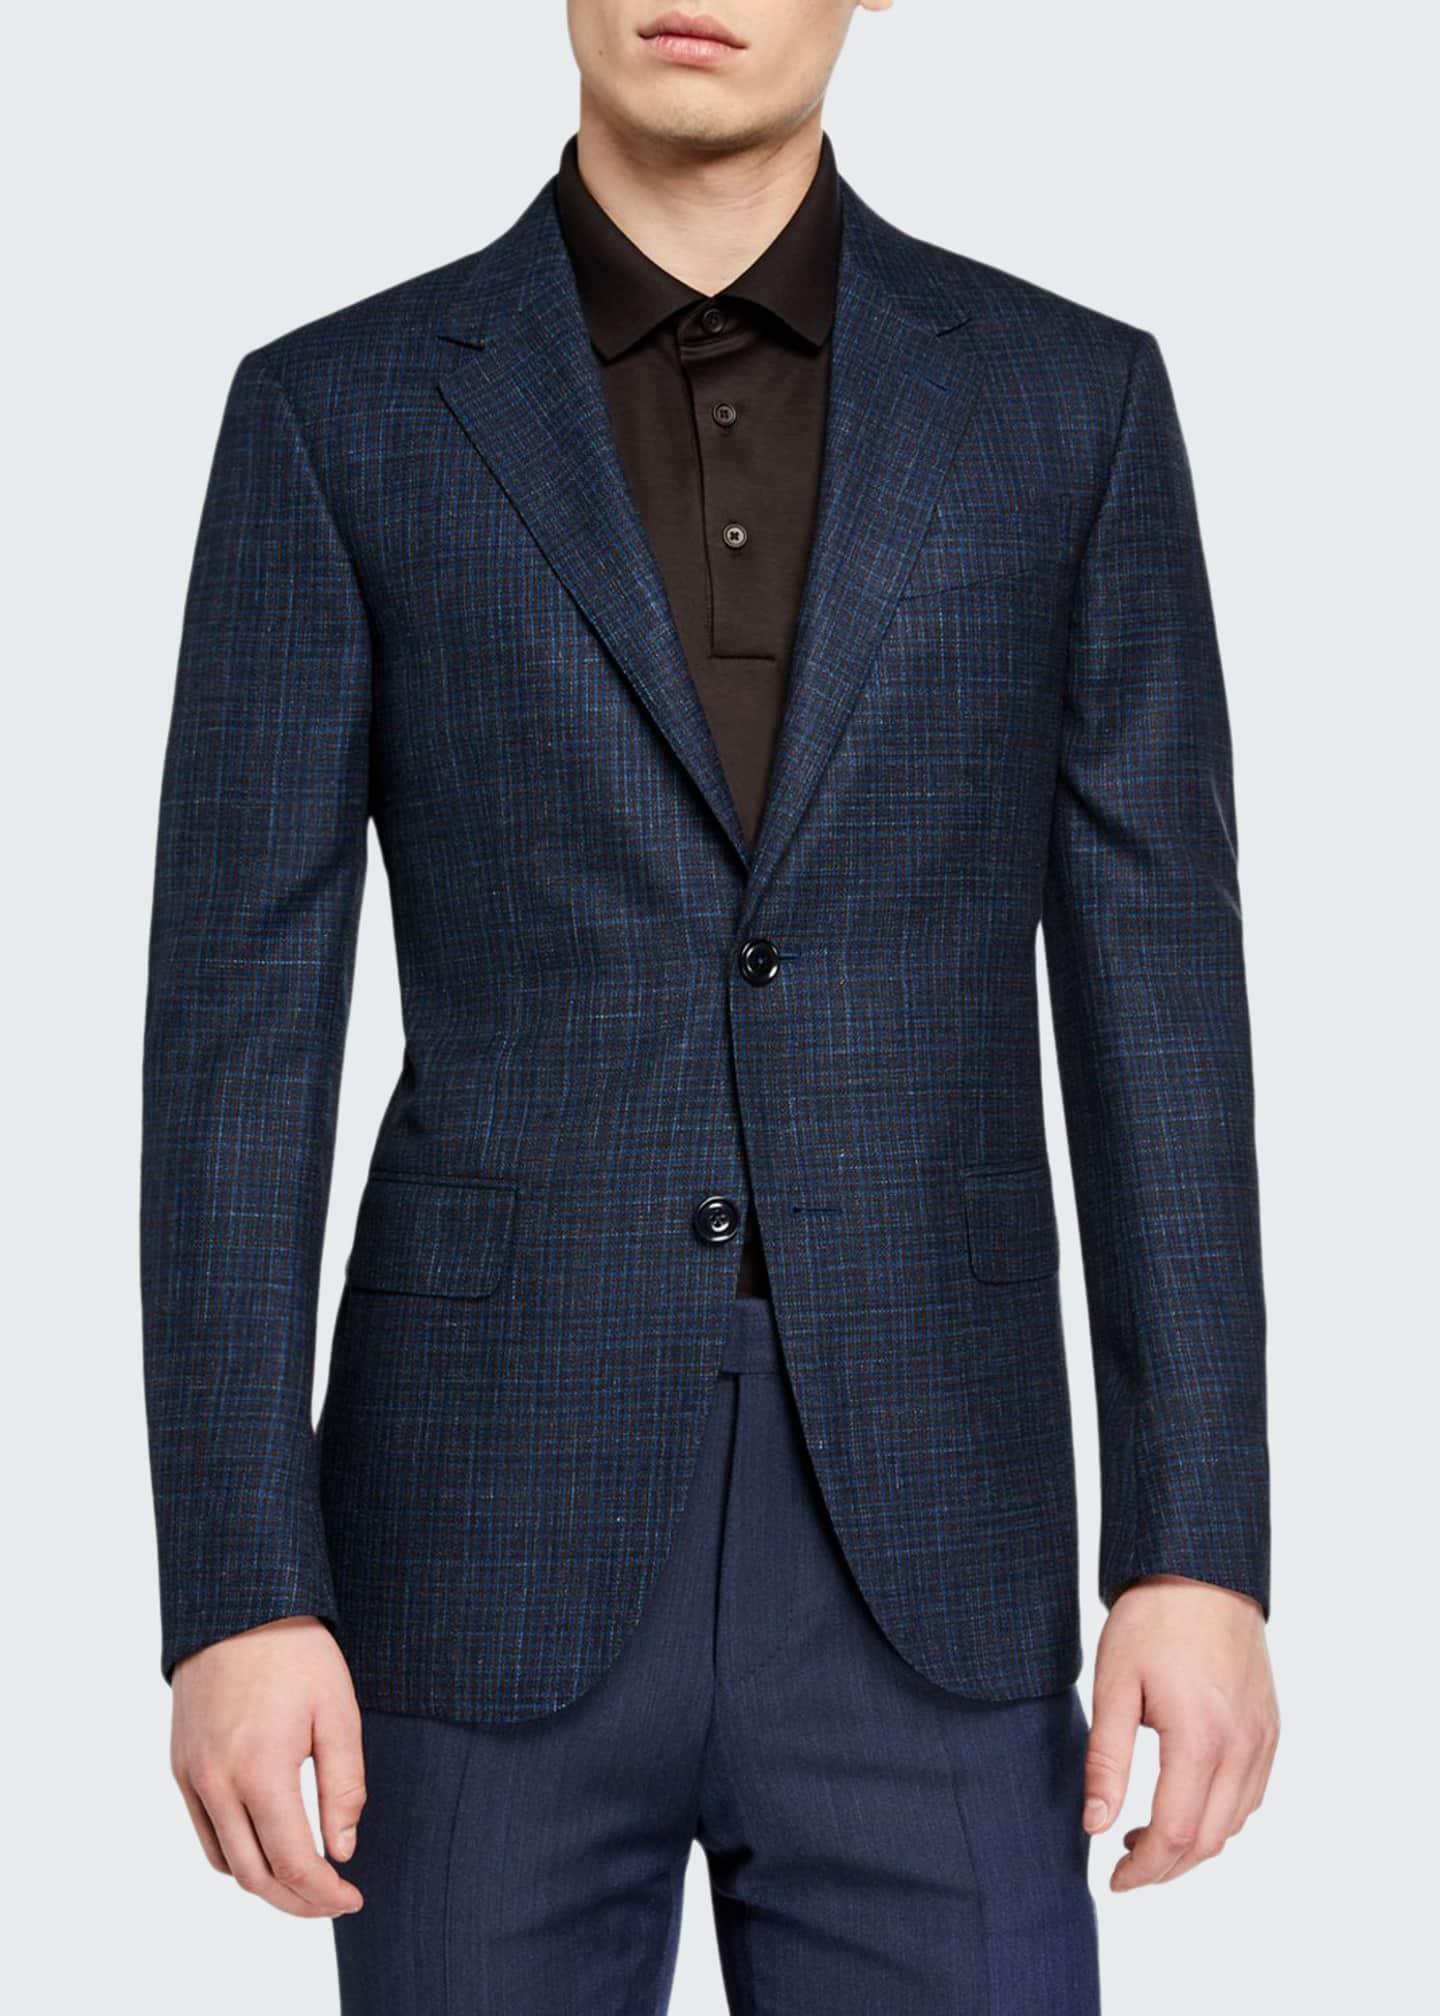 Ermenegildo Zegna Men's Wool-Blend Check Sport Coat